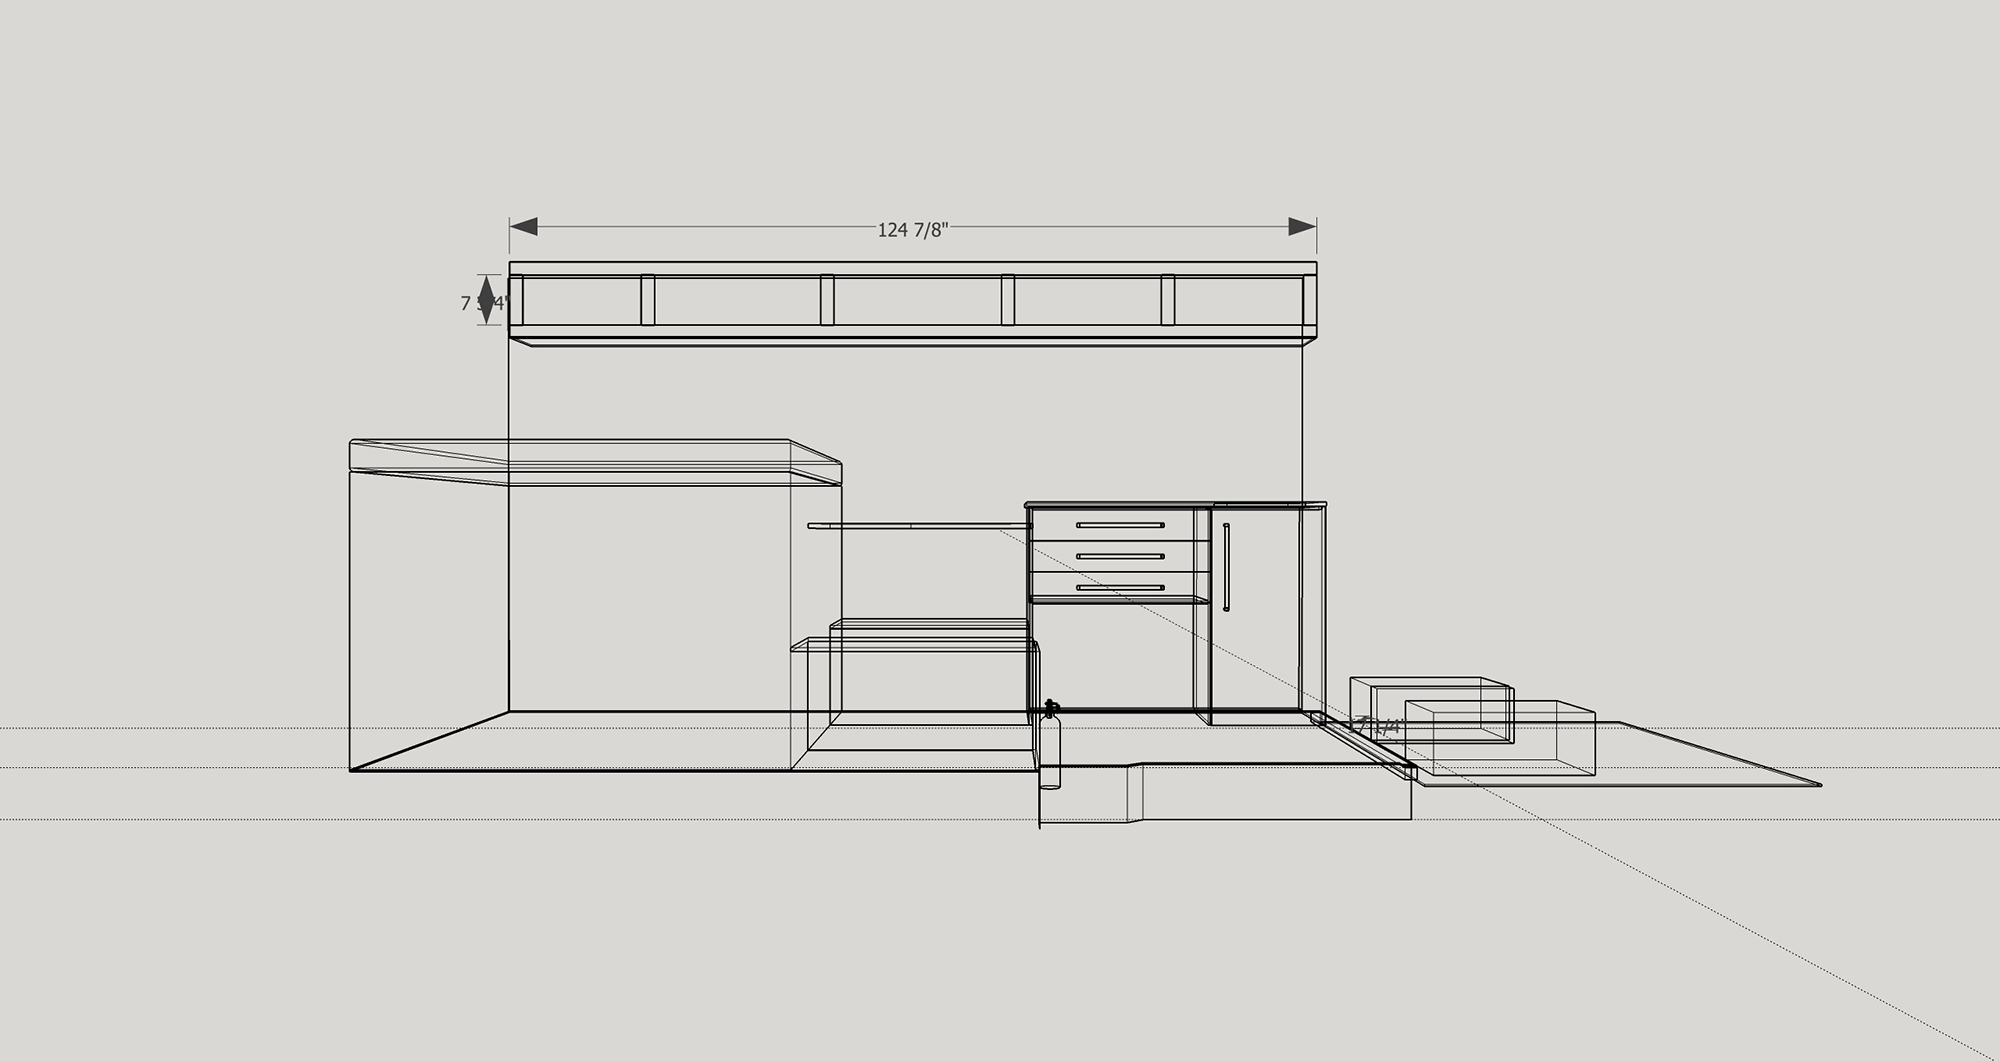 sherry designs conversion van wiring diagram